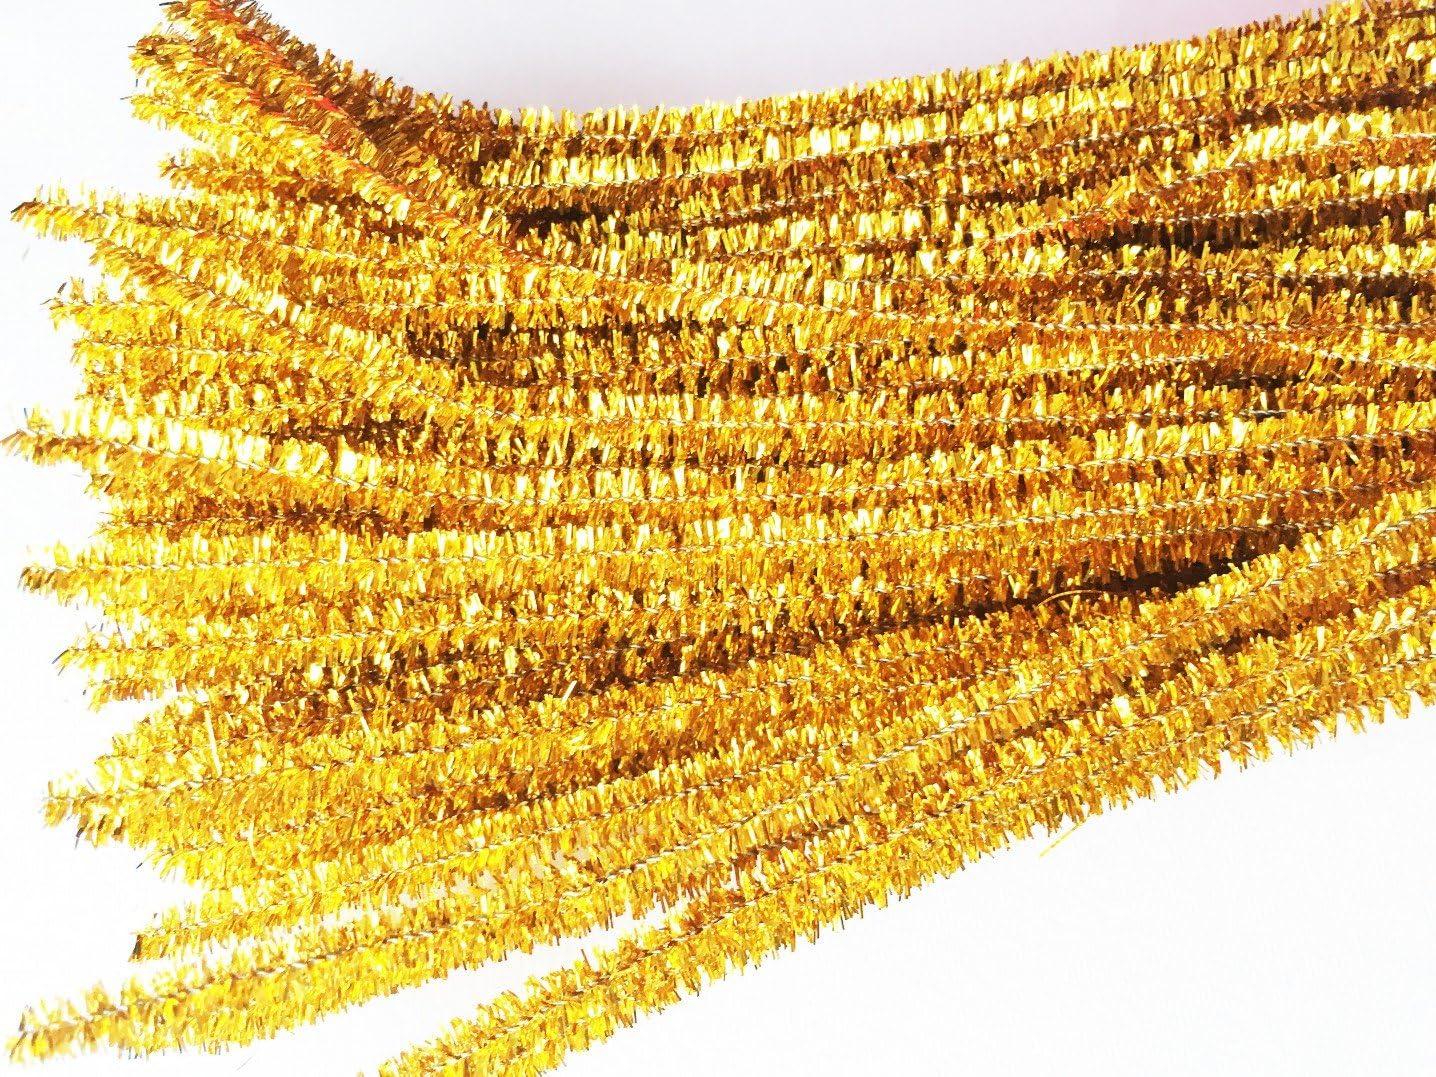 100 St/ück Carykon Pfeifenreiniger 30,5 cm gold glitzernd